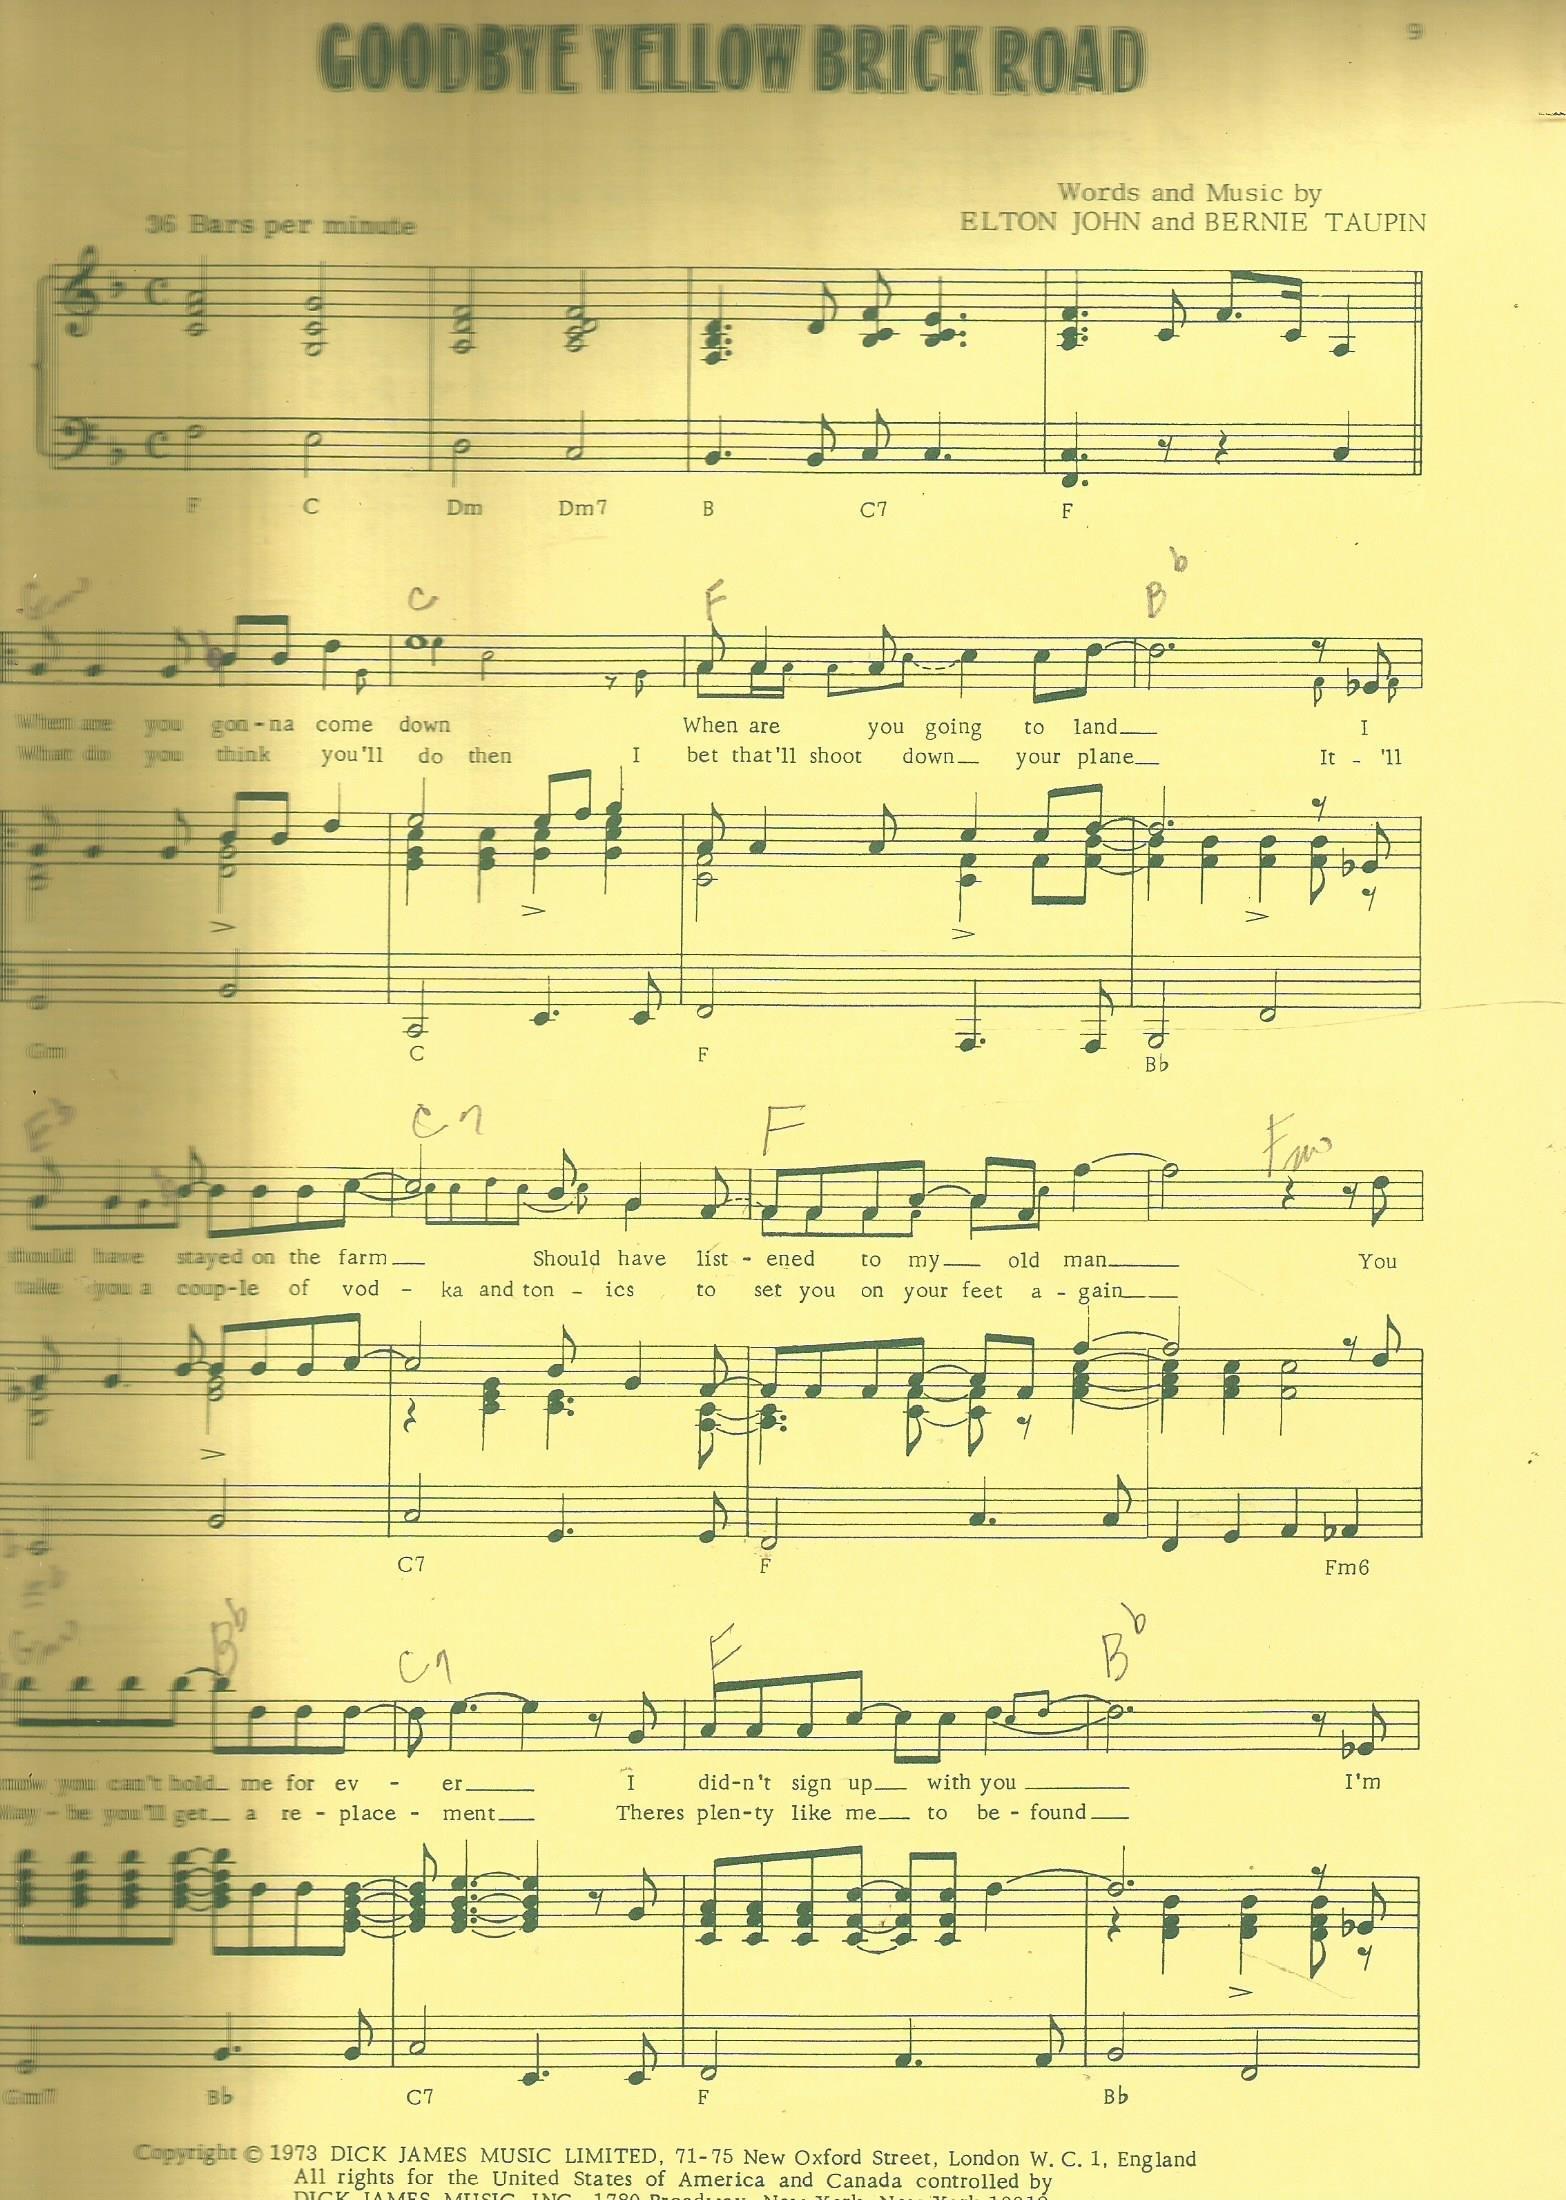 Goodbye Yellow Brick Road Songbook: Elton John, Bernie Taupin: Amazon:  Books